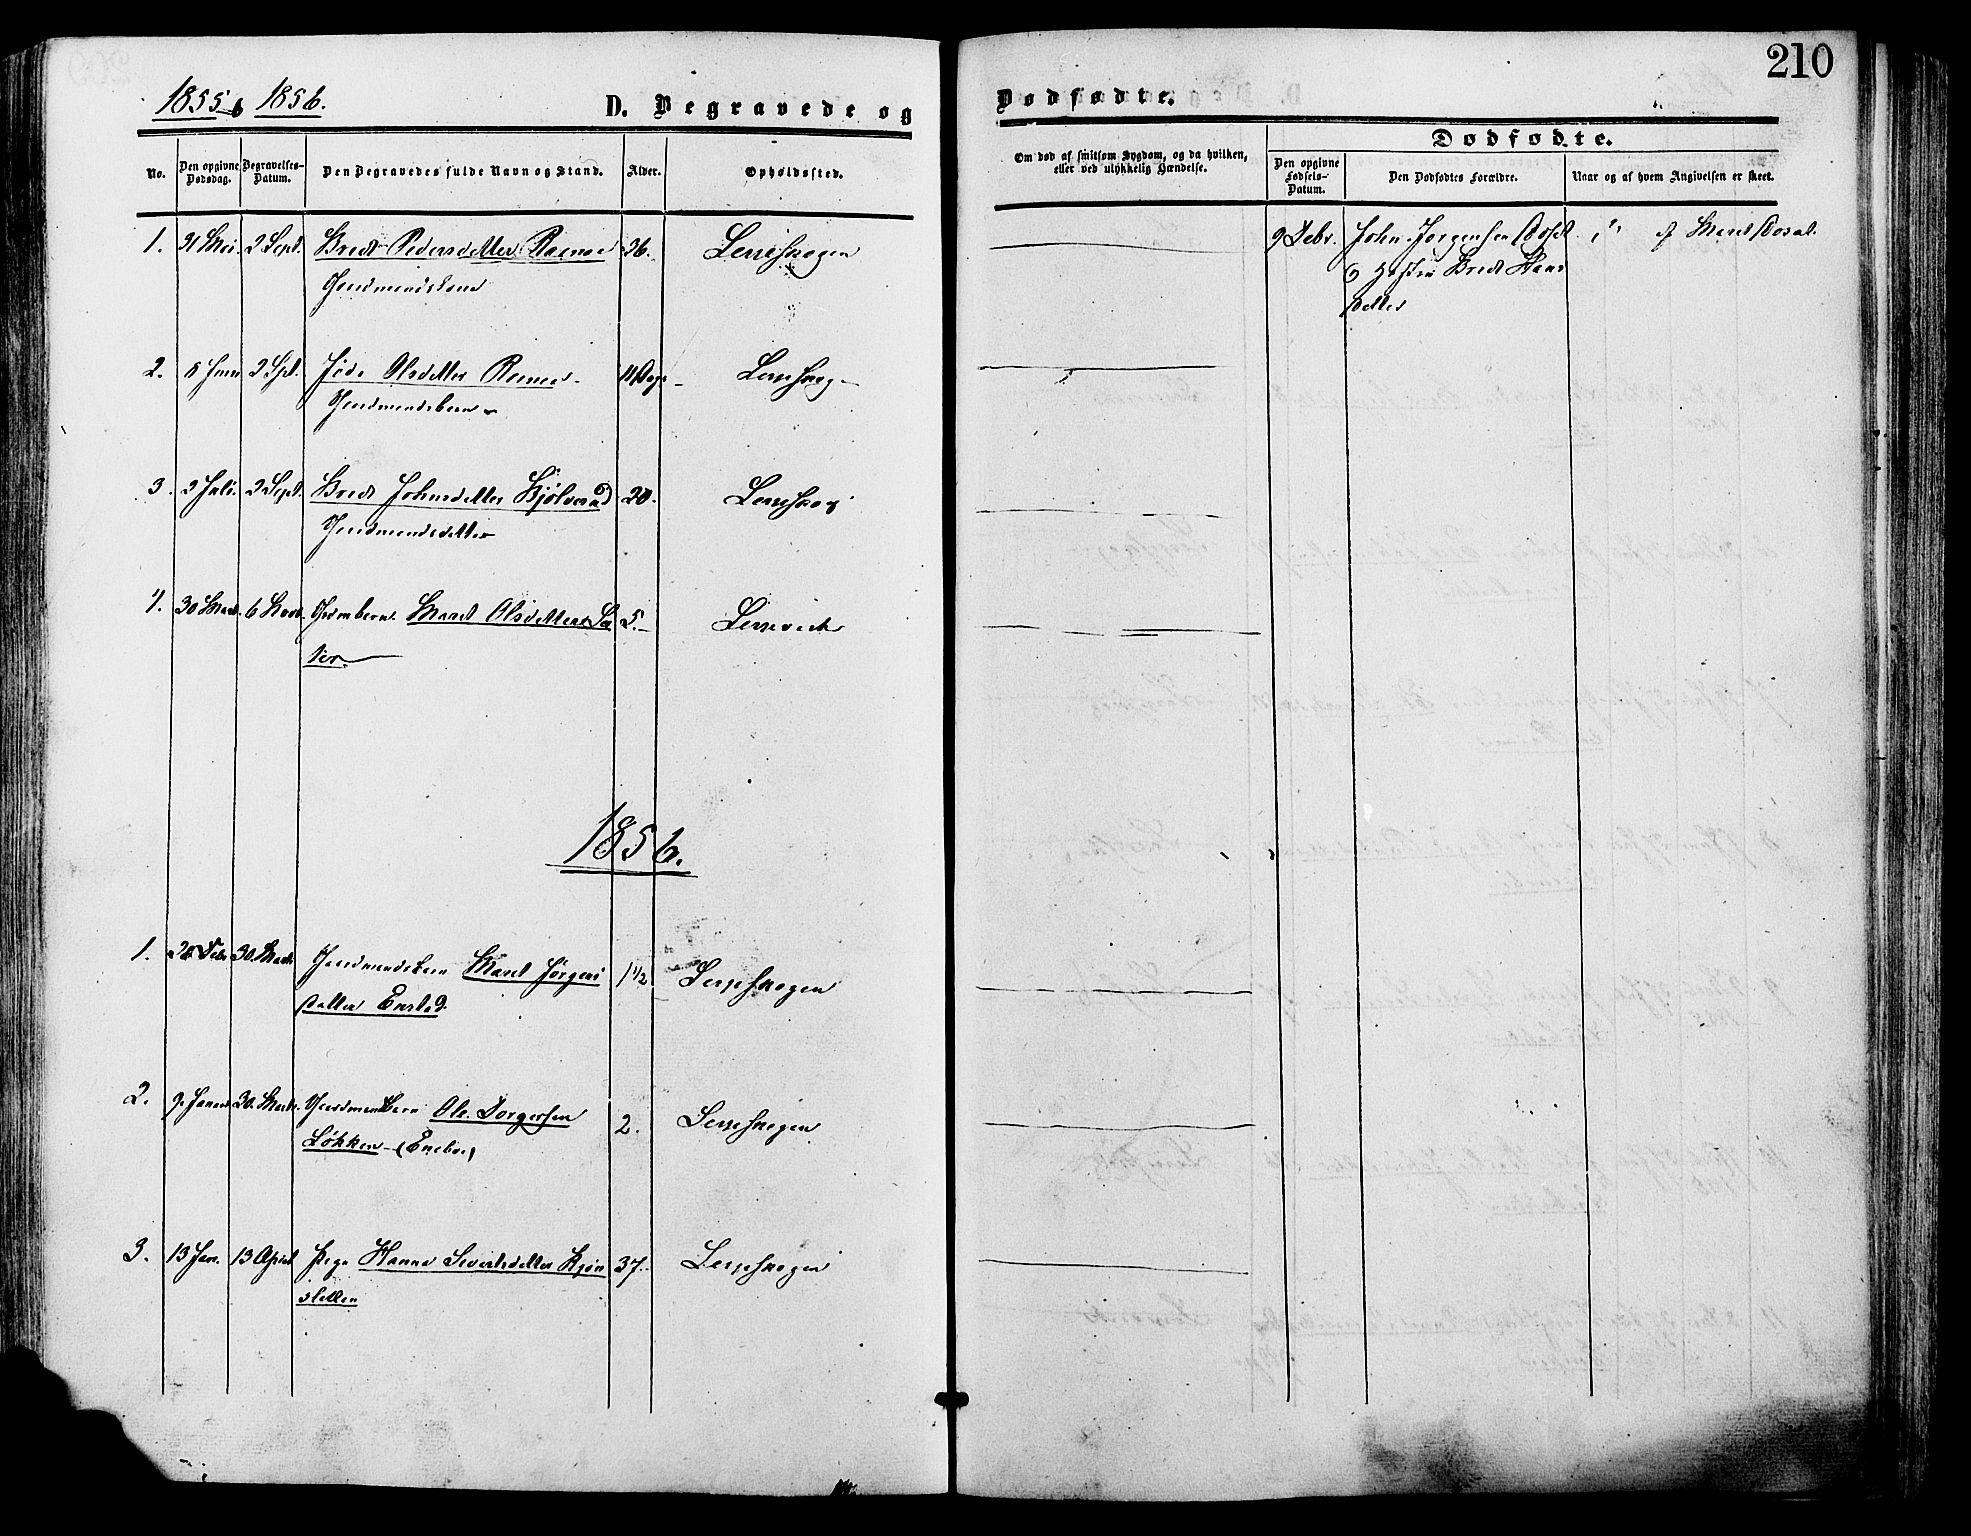 SAH, Lesja prestekontor, Ministerialbok nr. 9, 1854-1889, s. 210